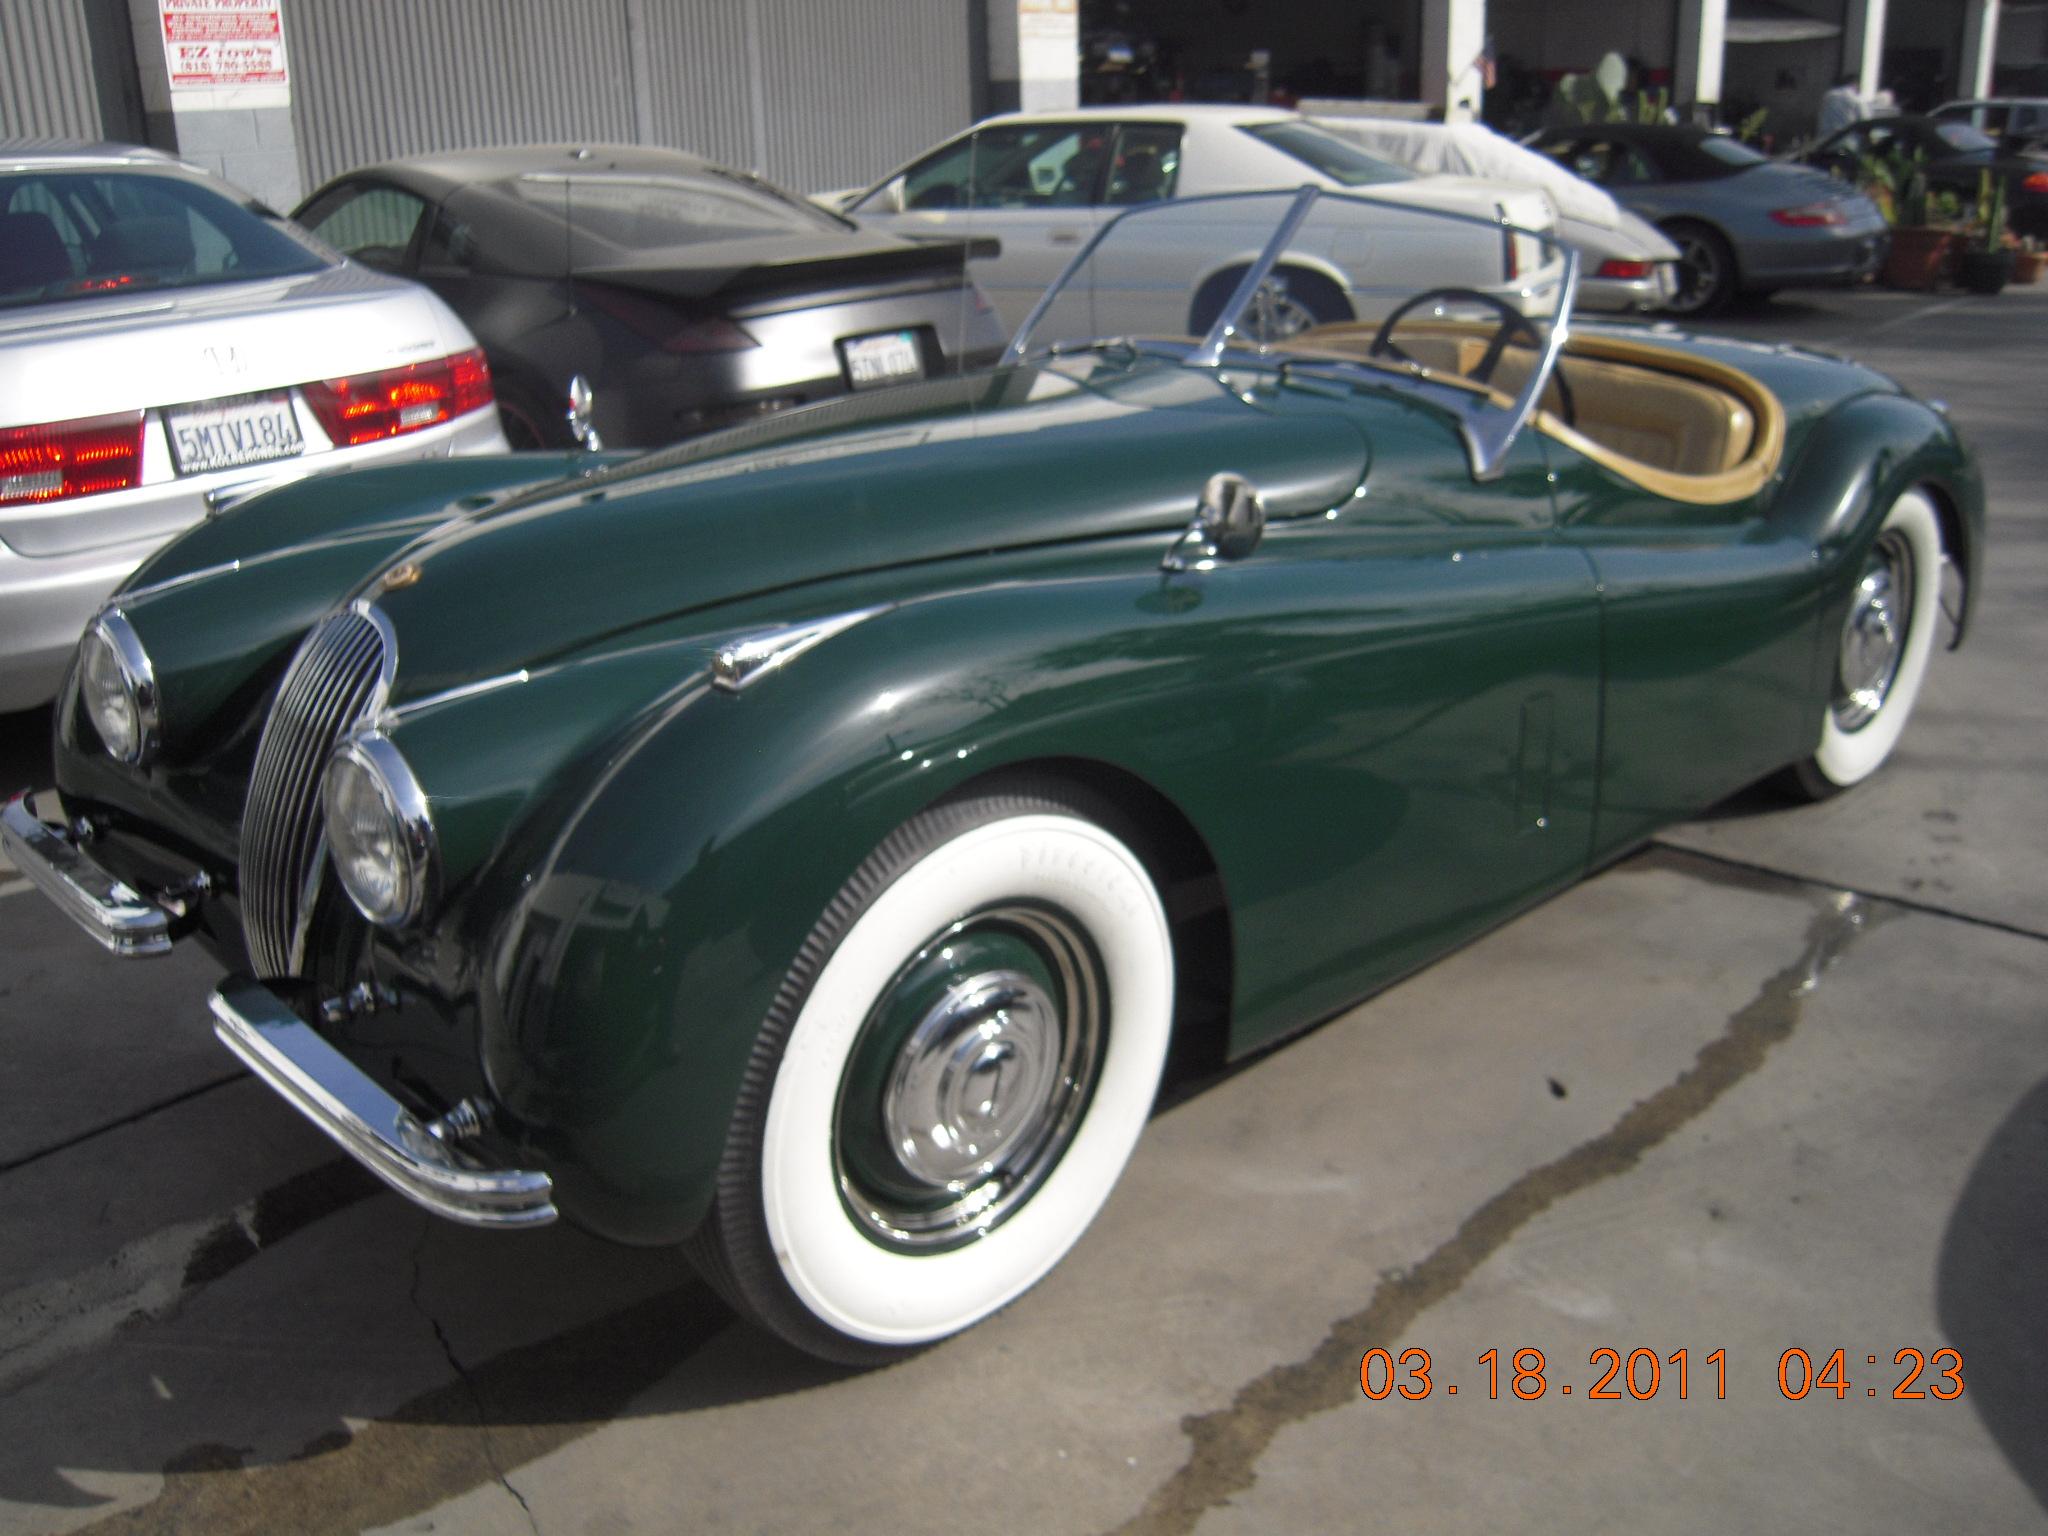 Classic Car Restorations   Vintage Car Restorations   WEST COAST BODY AND  PAINT   Auto Body Shop   Collision Repair   Car Restorations   Paint Shop    Van ...